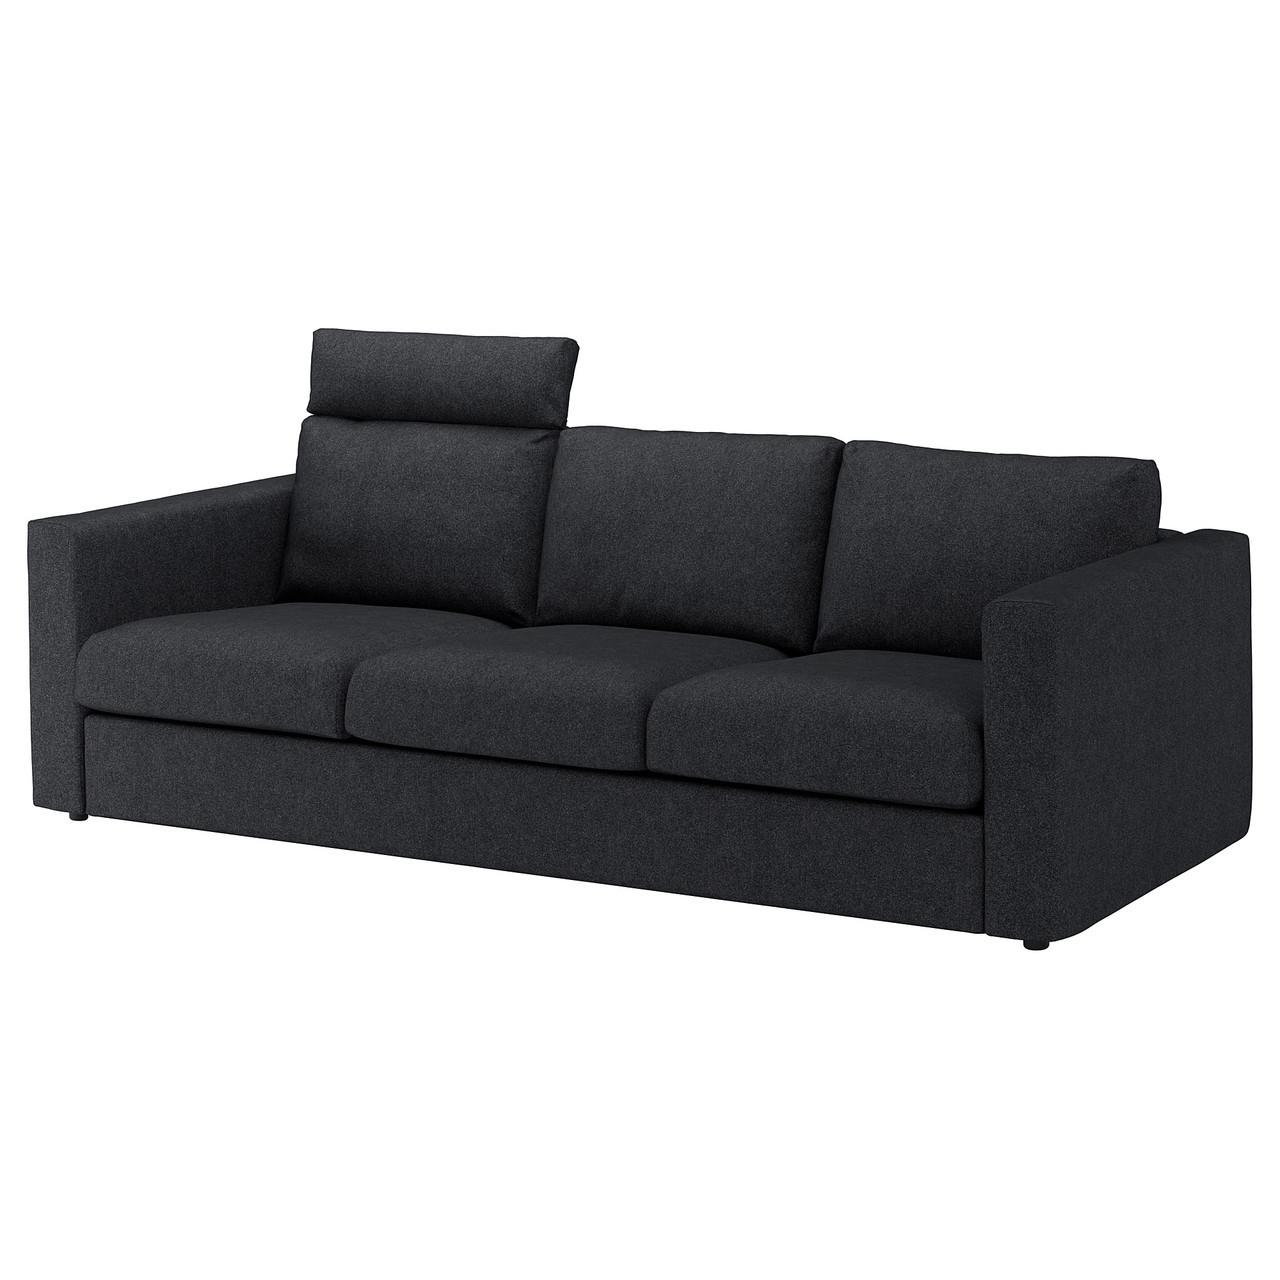 IKEA VIMLE (392.566.22) Трехместный диван, изголовье